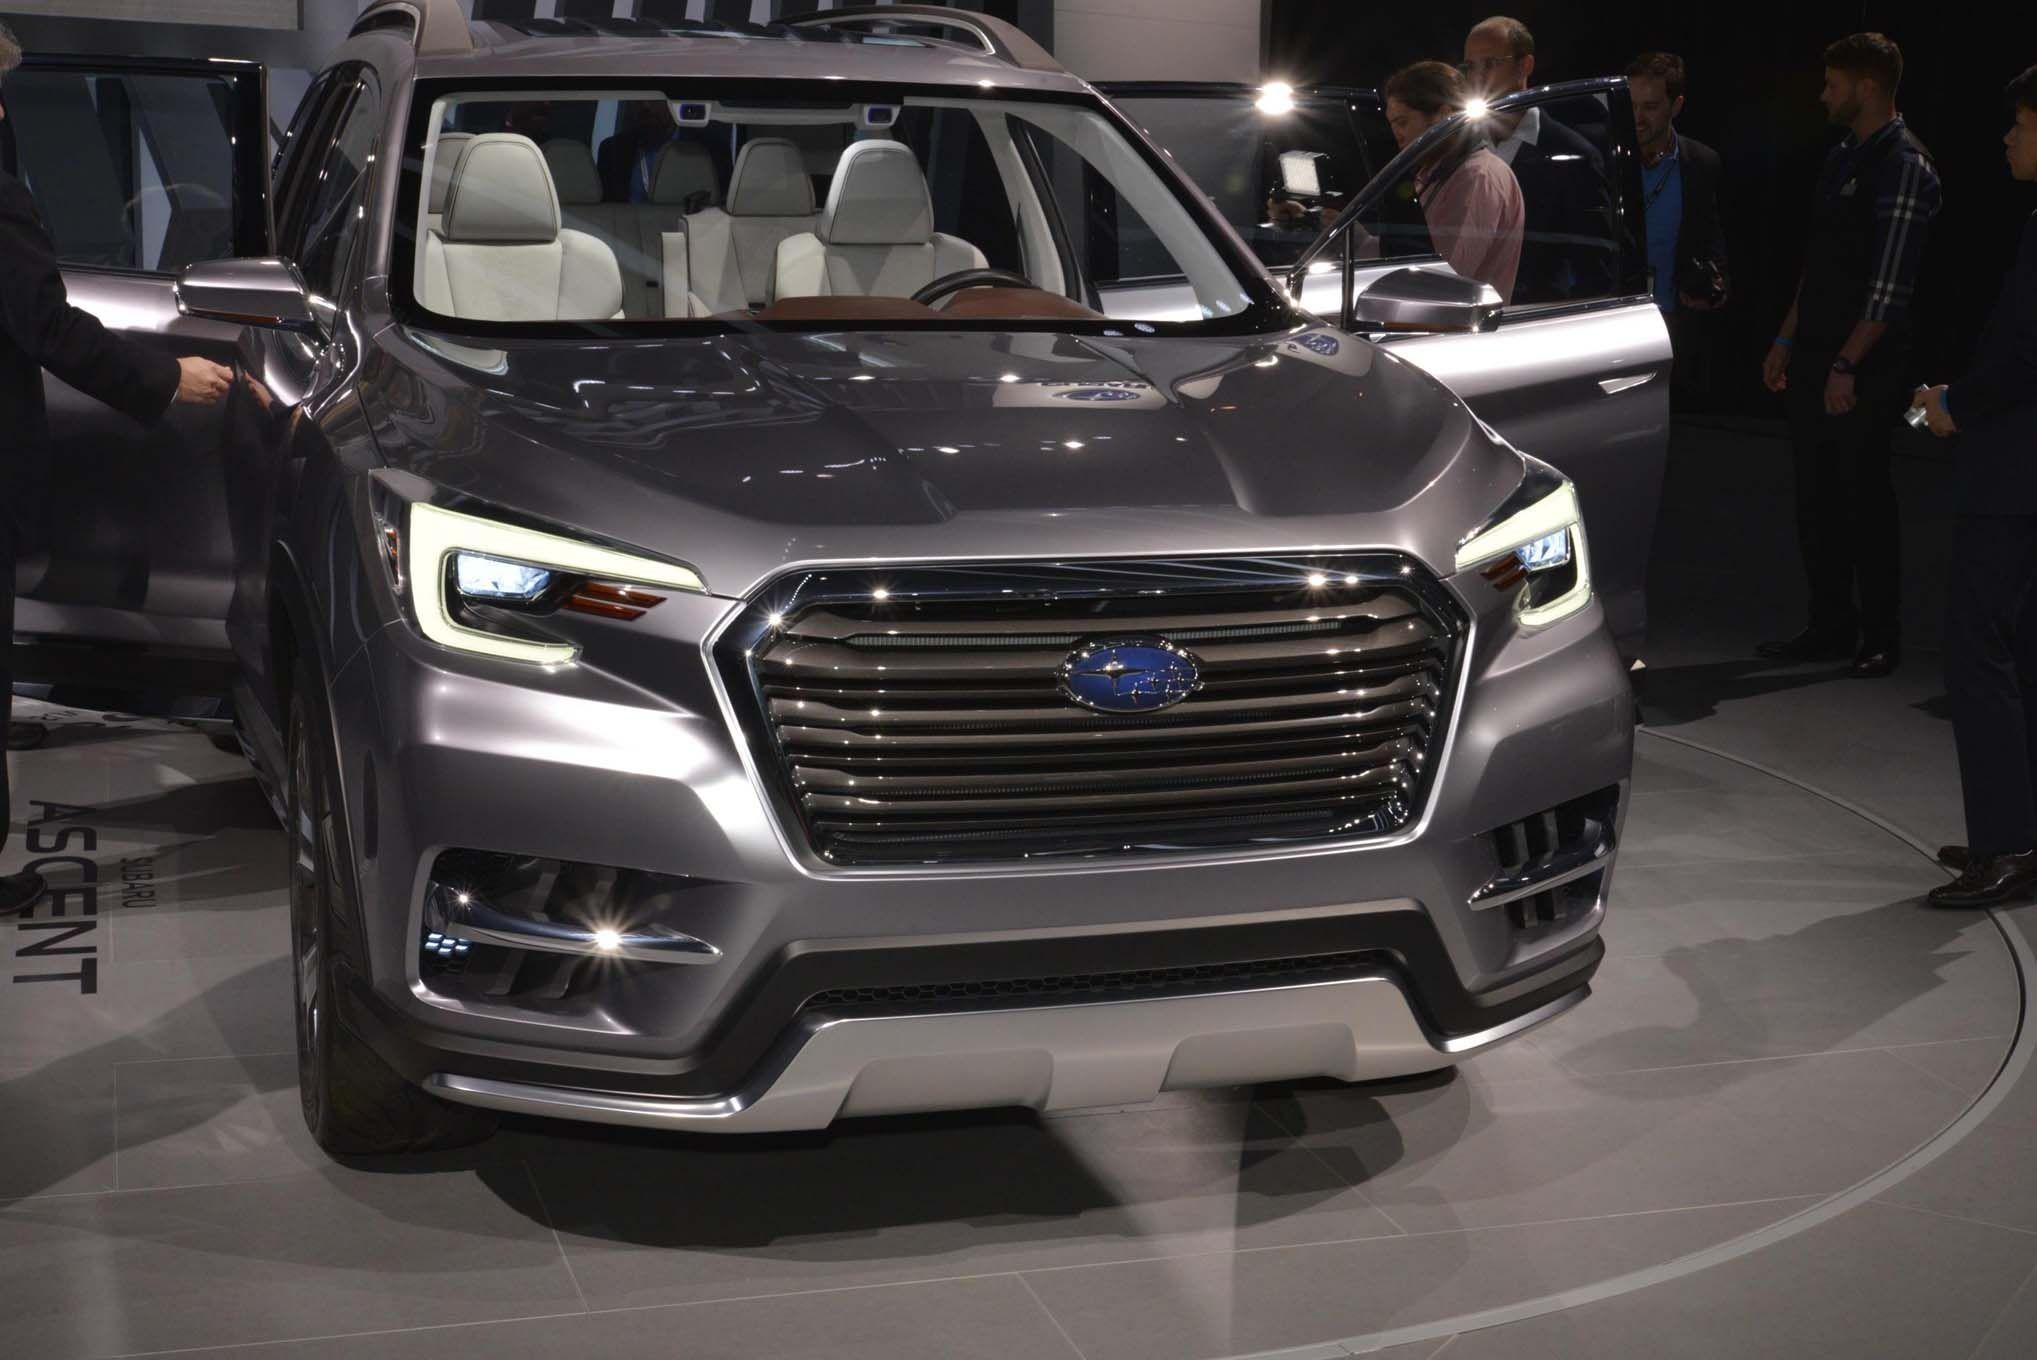 2019 Subaru Forester Exterior And Interior Review Car And Home Pinterest Subaru Forester